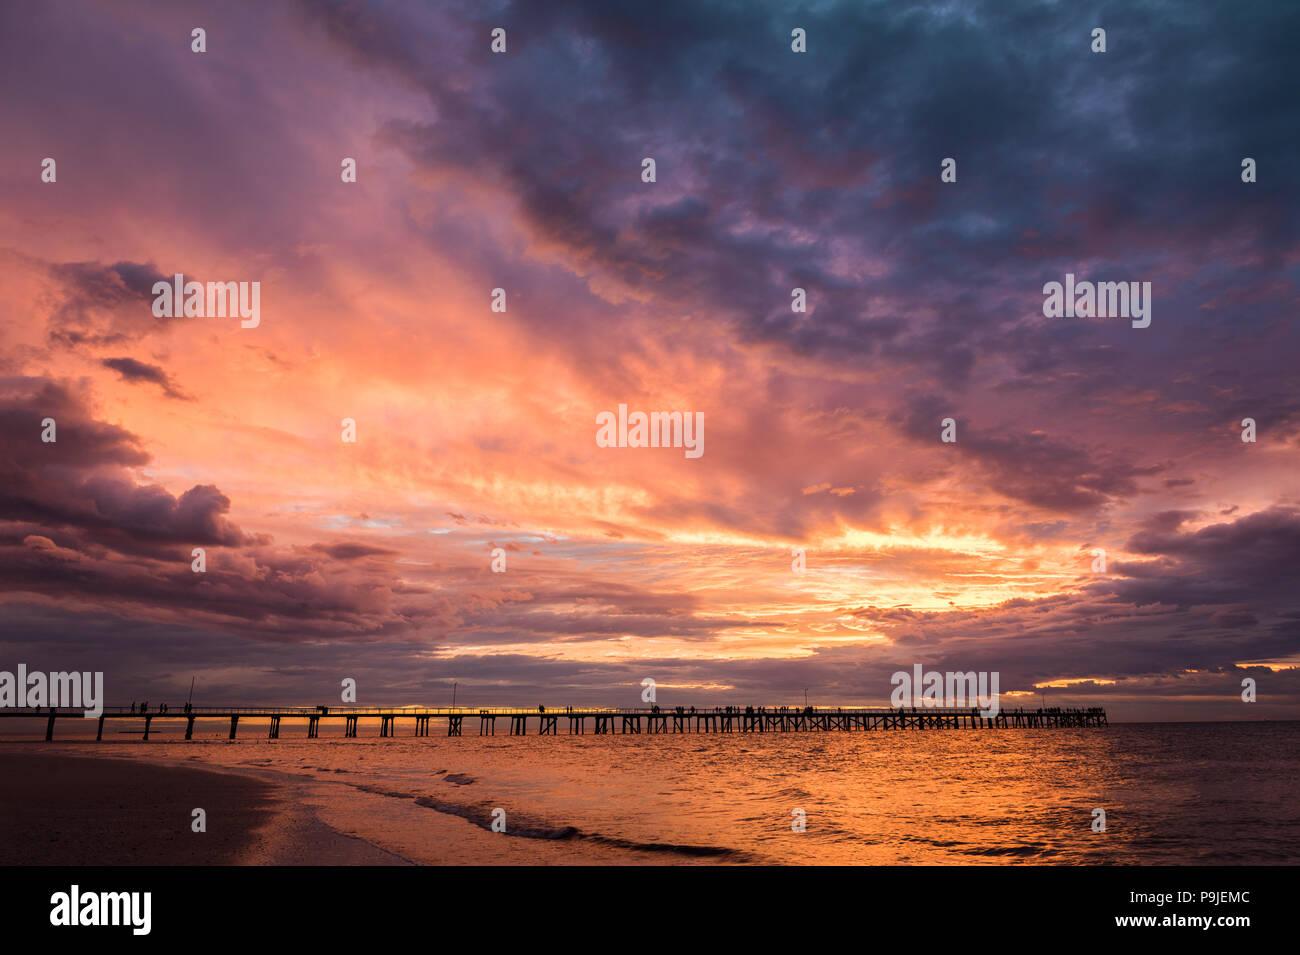 Sunset at the popular Semaphore Jetty, near Adelaide, South Australia. - Stock Image